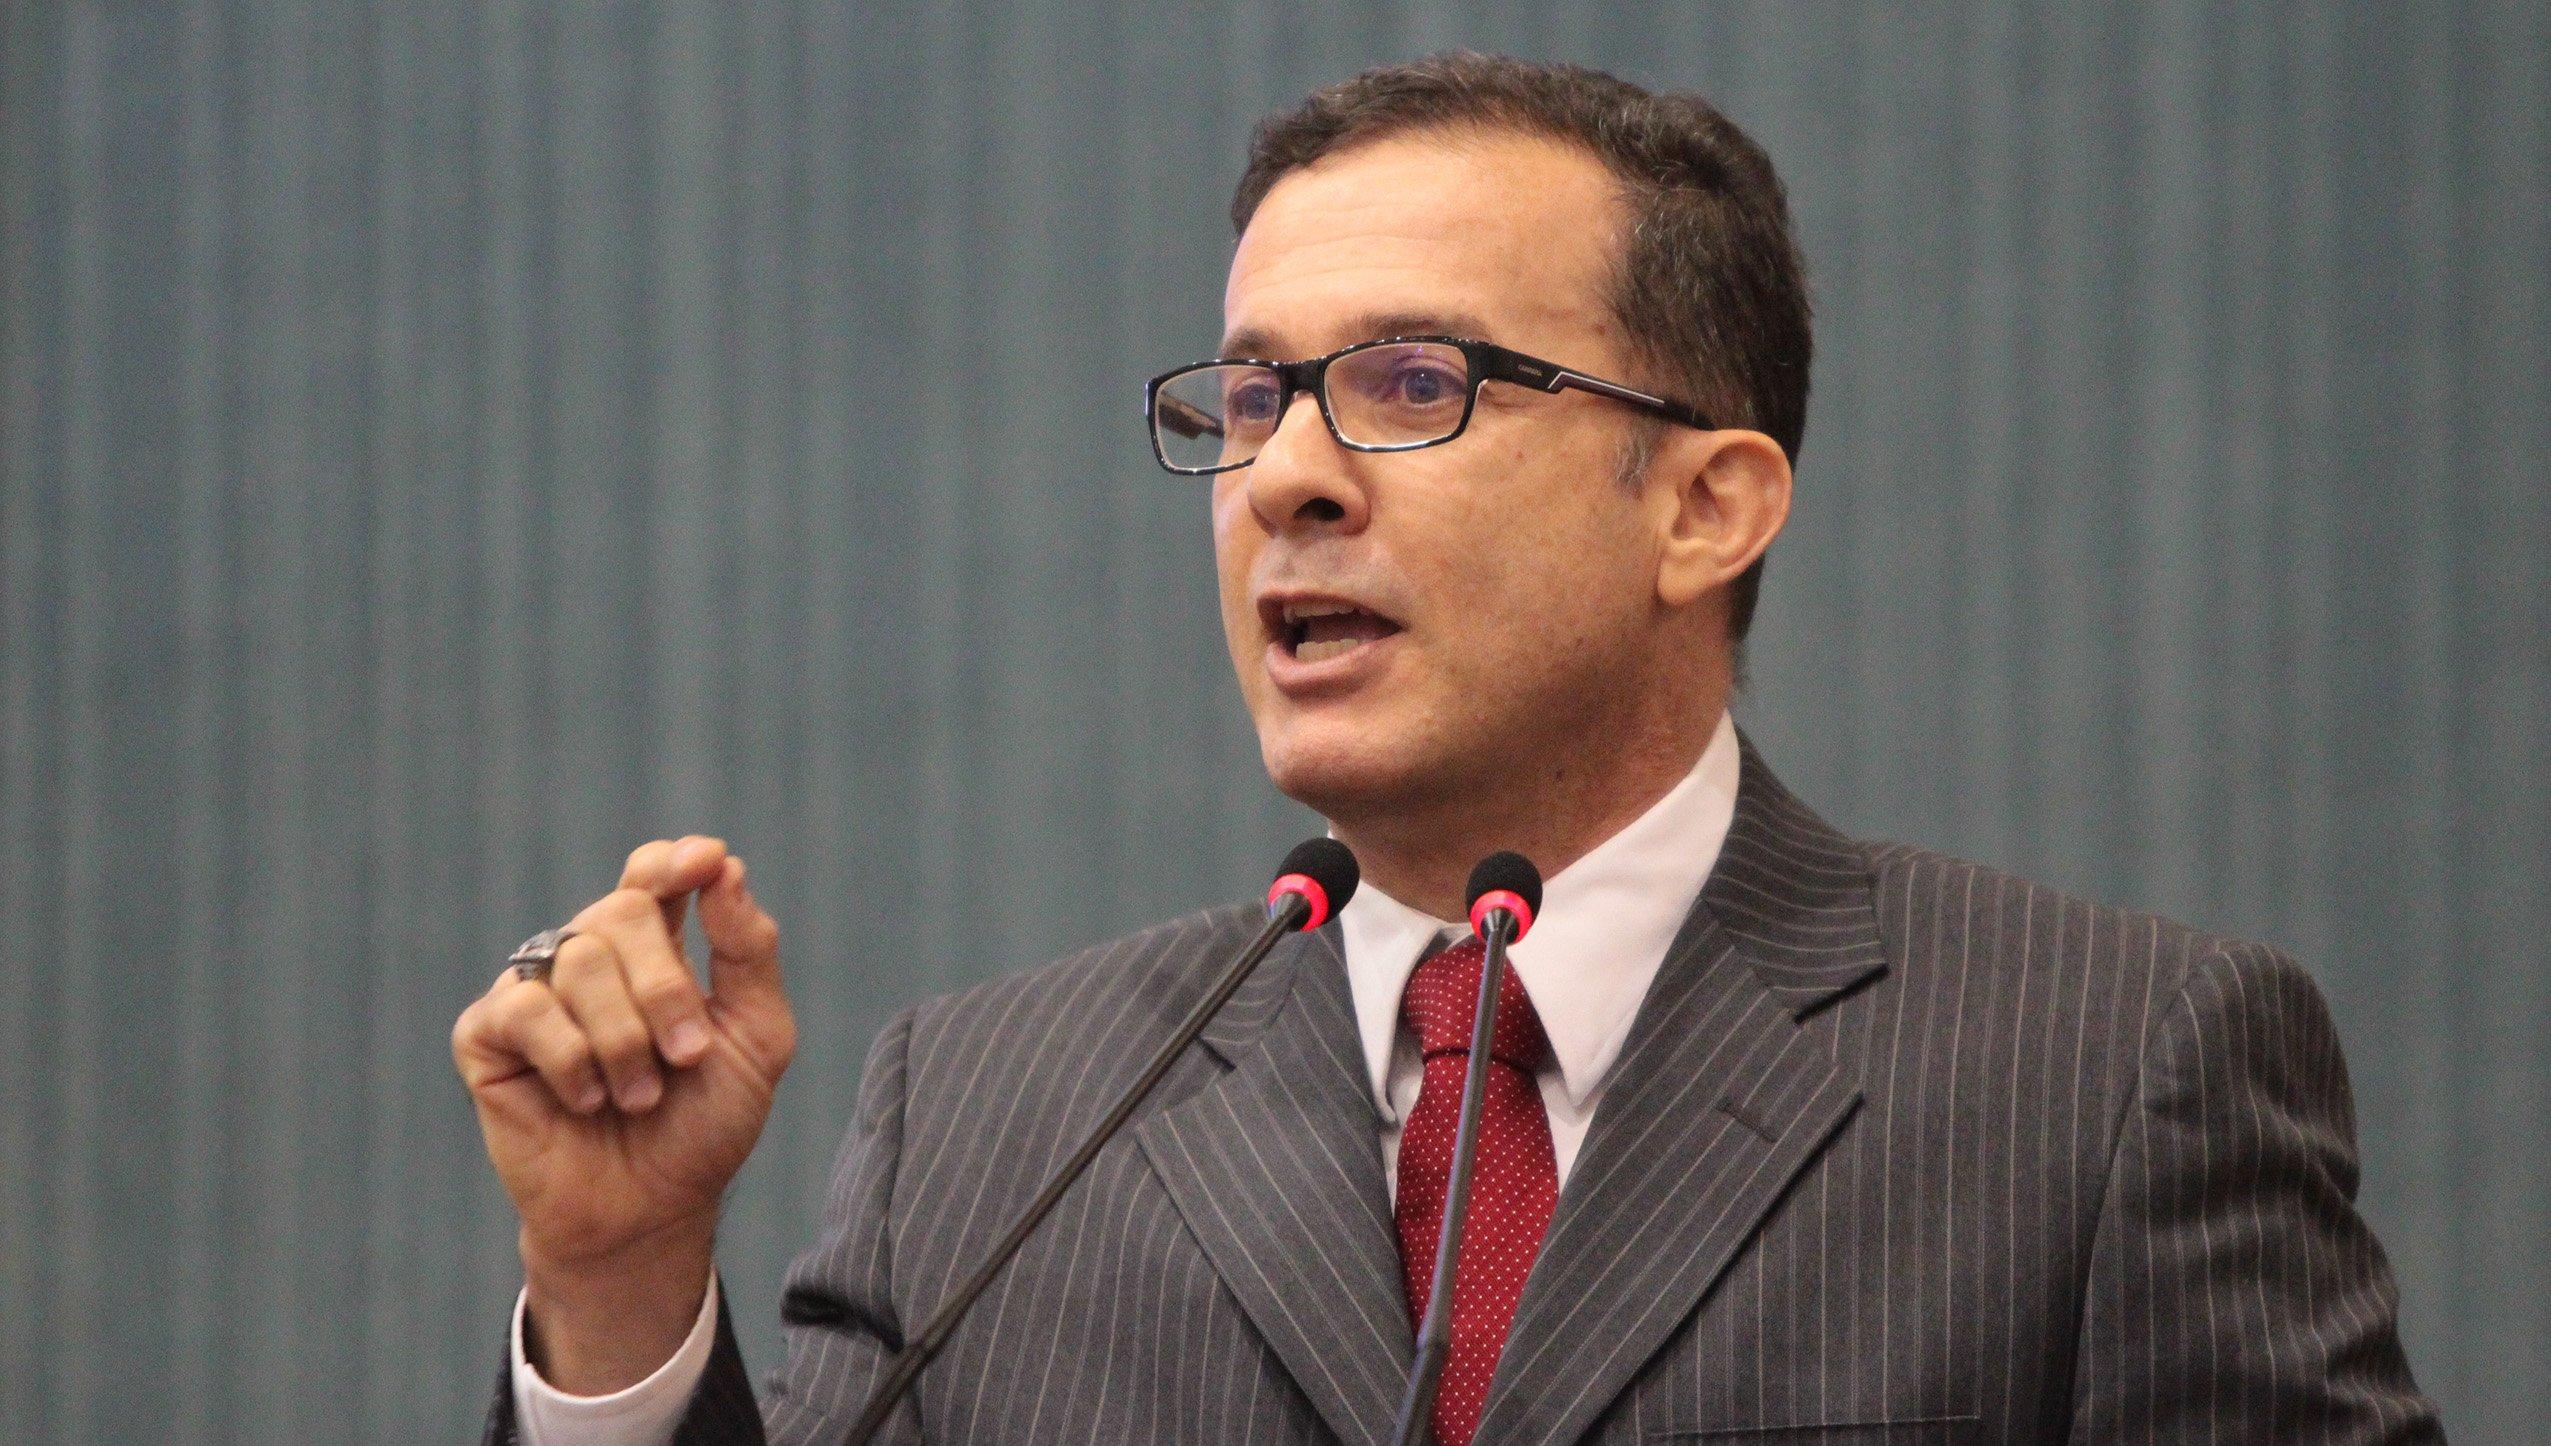 MANAUS 21.03.17 VEREADOR CHICO PRETO (PMN) DURANTE SESSAO PLENARIA DA CAMARA MUNICIPAL DE MANAUS (CMM). FOTO:TIAGO CORREA/CMM.